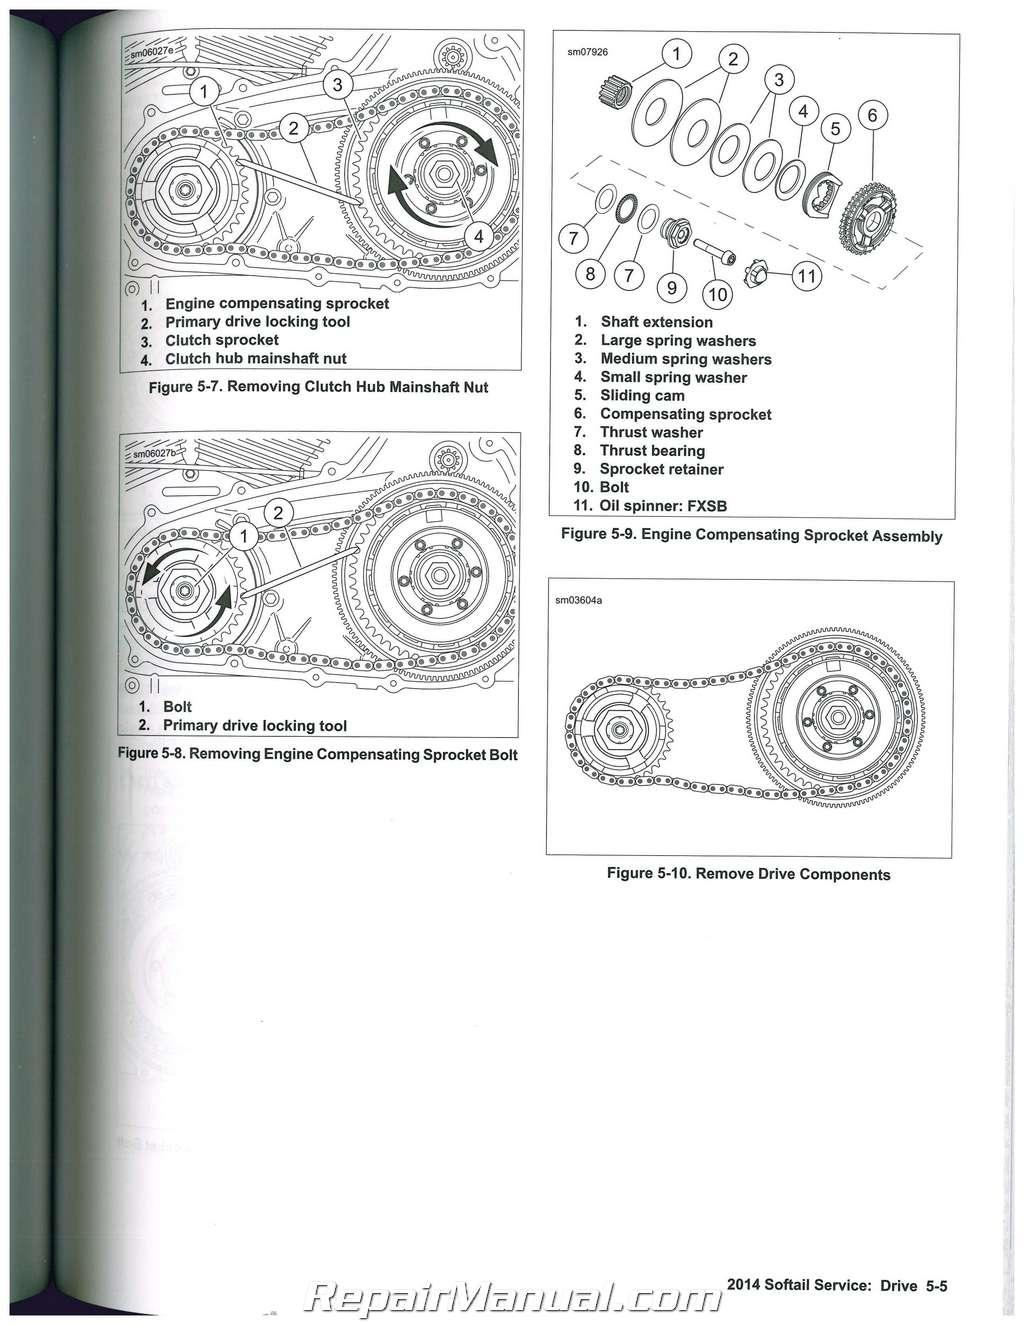 Harley Davidson Softail Motorcycle Service Manual